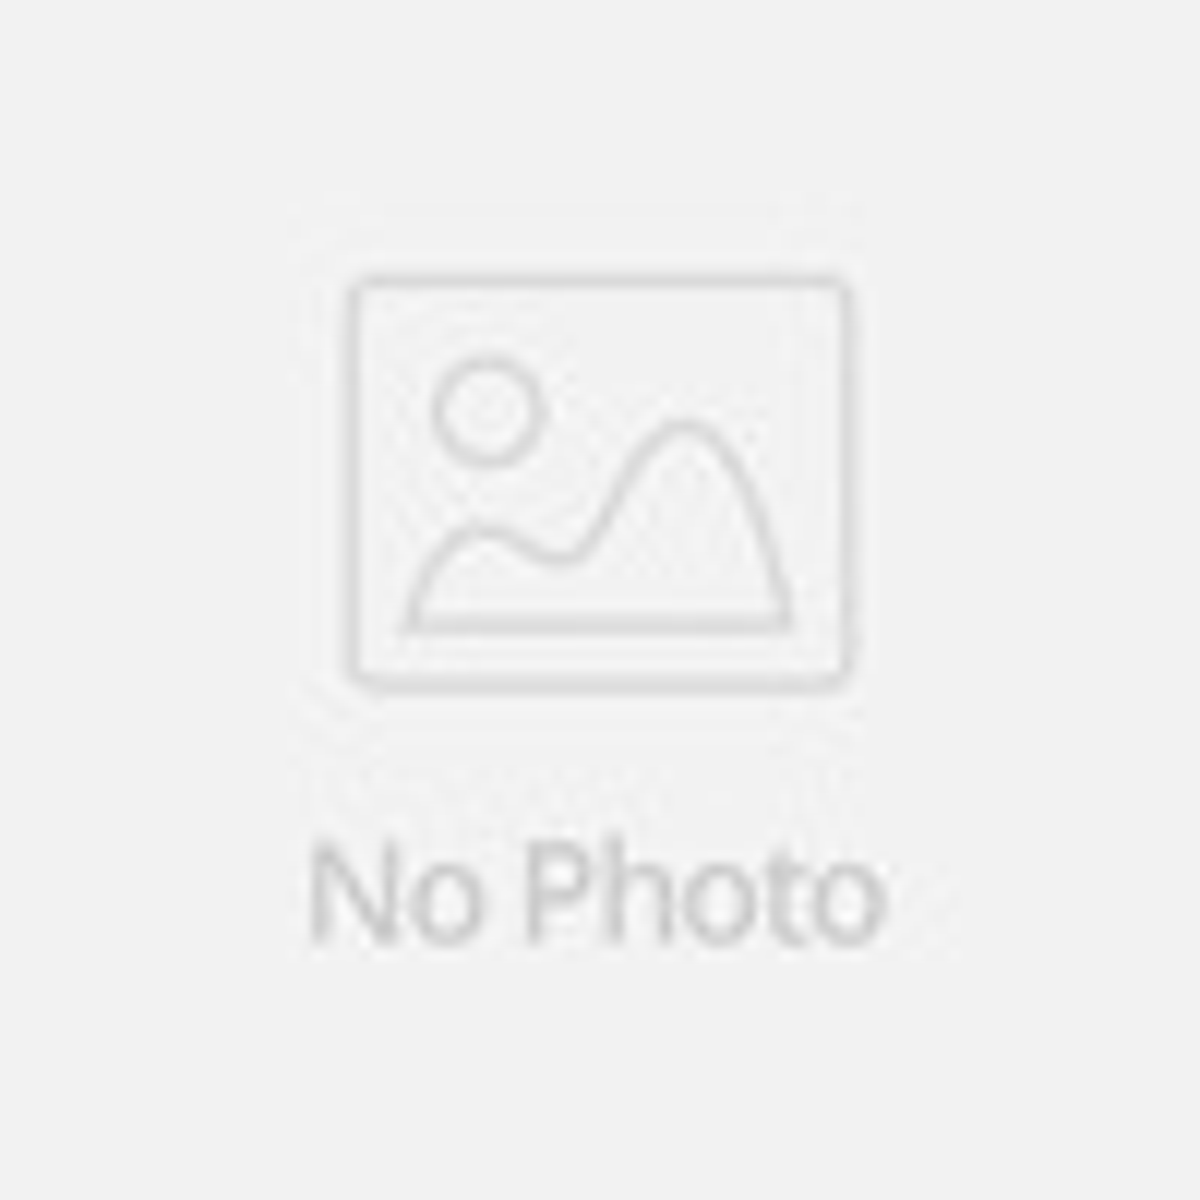 2015 Real Hot Sale Ham Radio Radio Walkie Talkie 350 Handheld Walkie Talkie Civil Intercom Hand-sets A Pair of 2000 Function(China (Mainland))